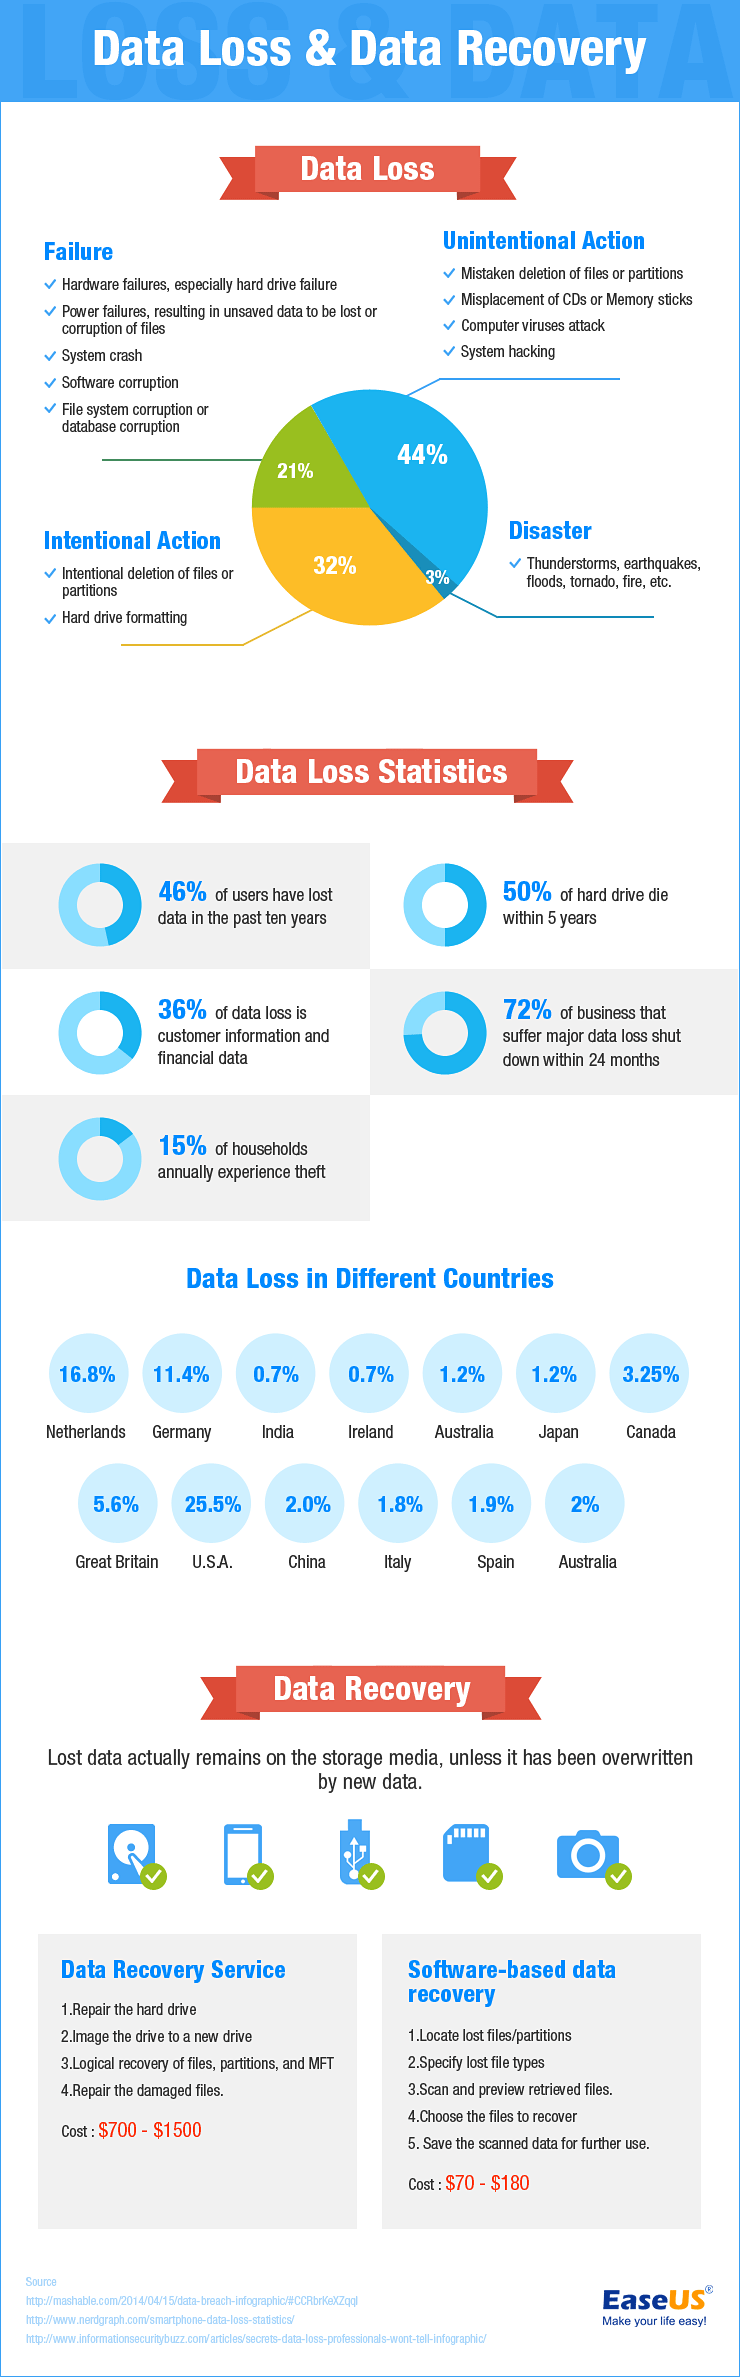 Data-loss-data-recovery